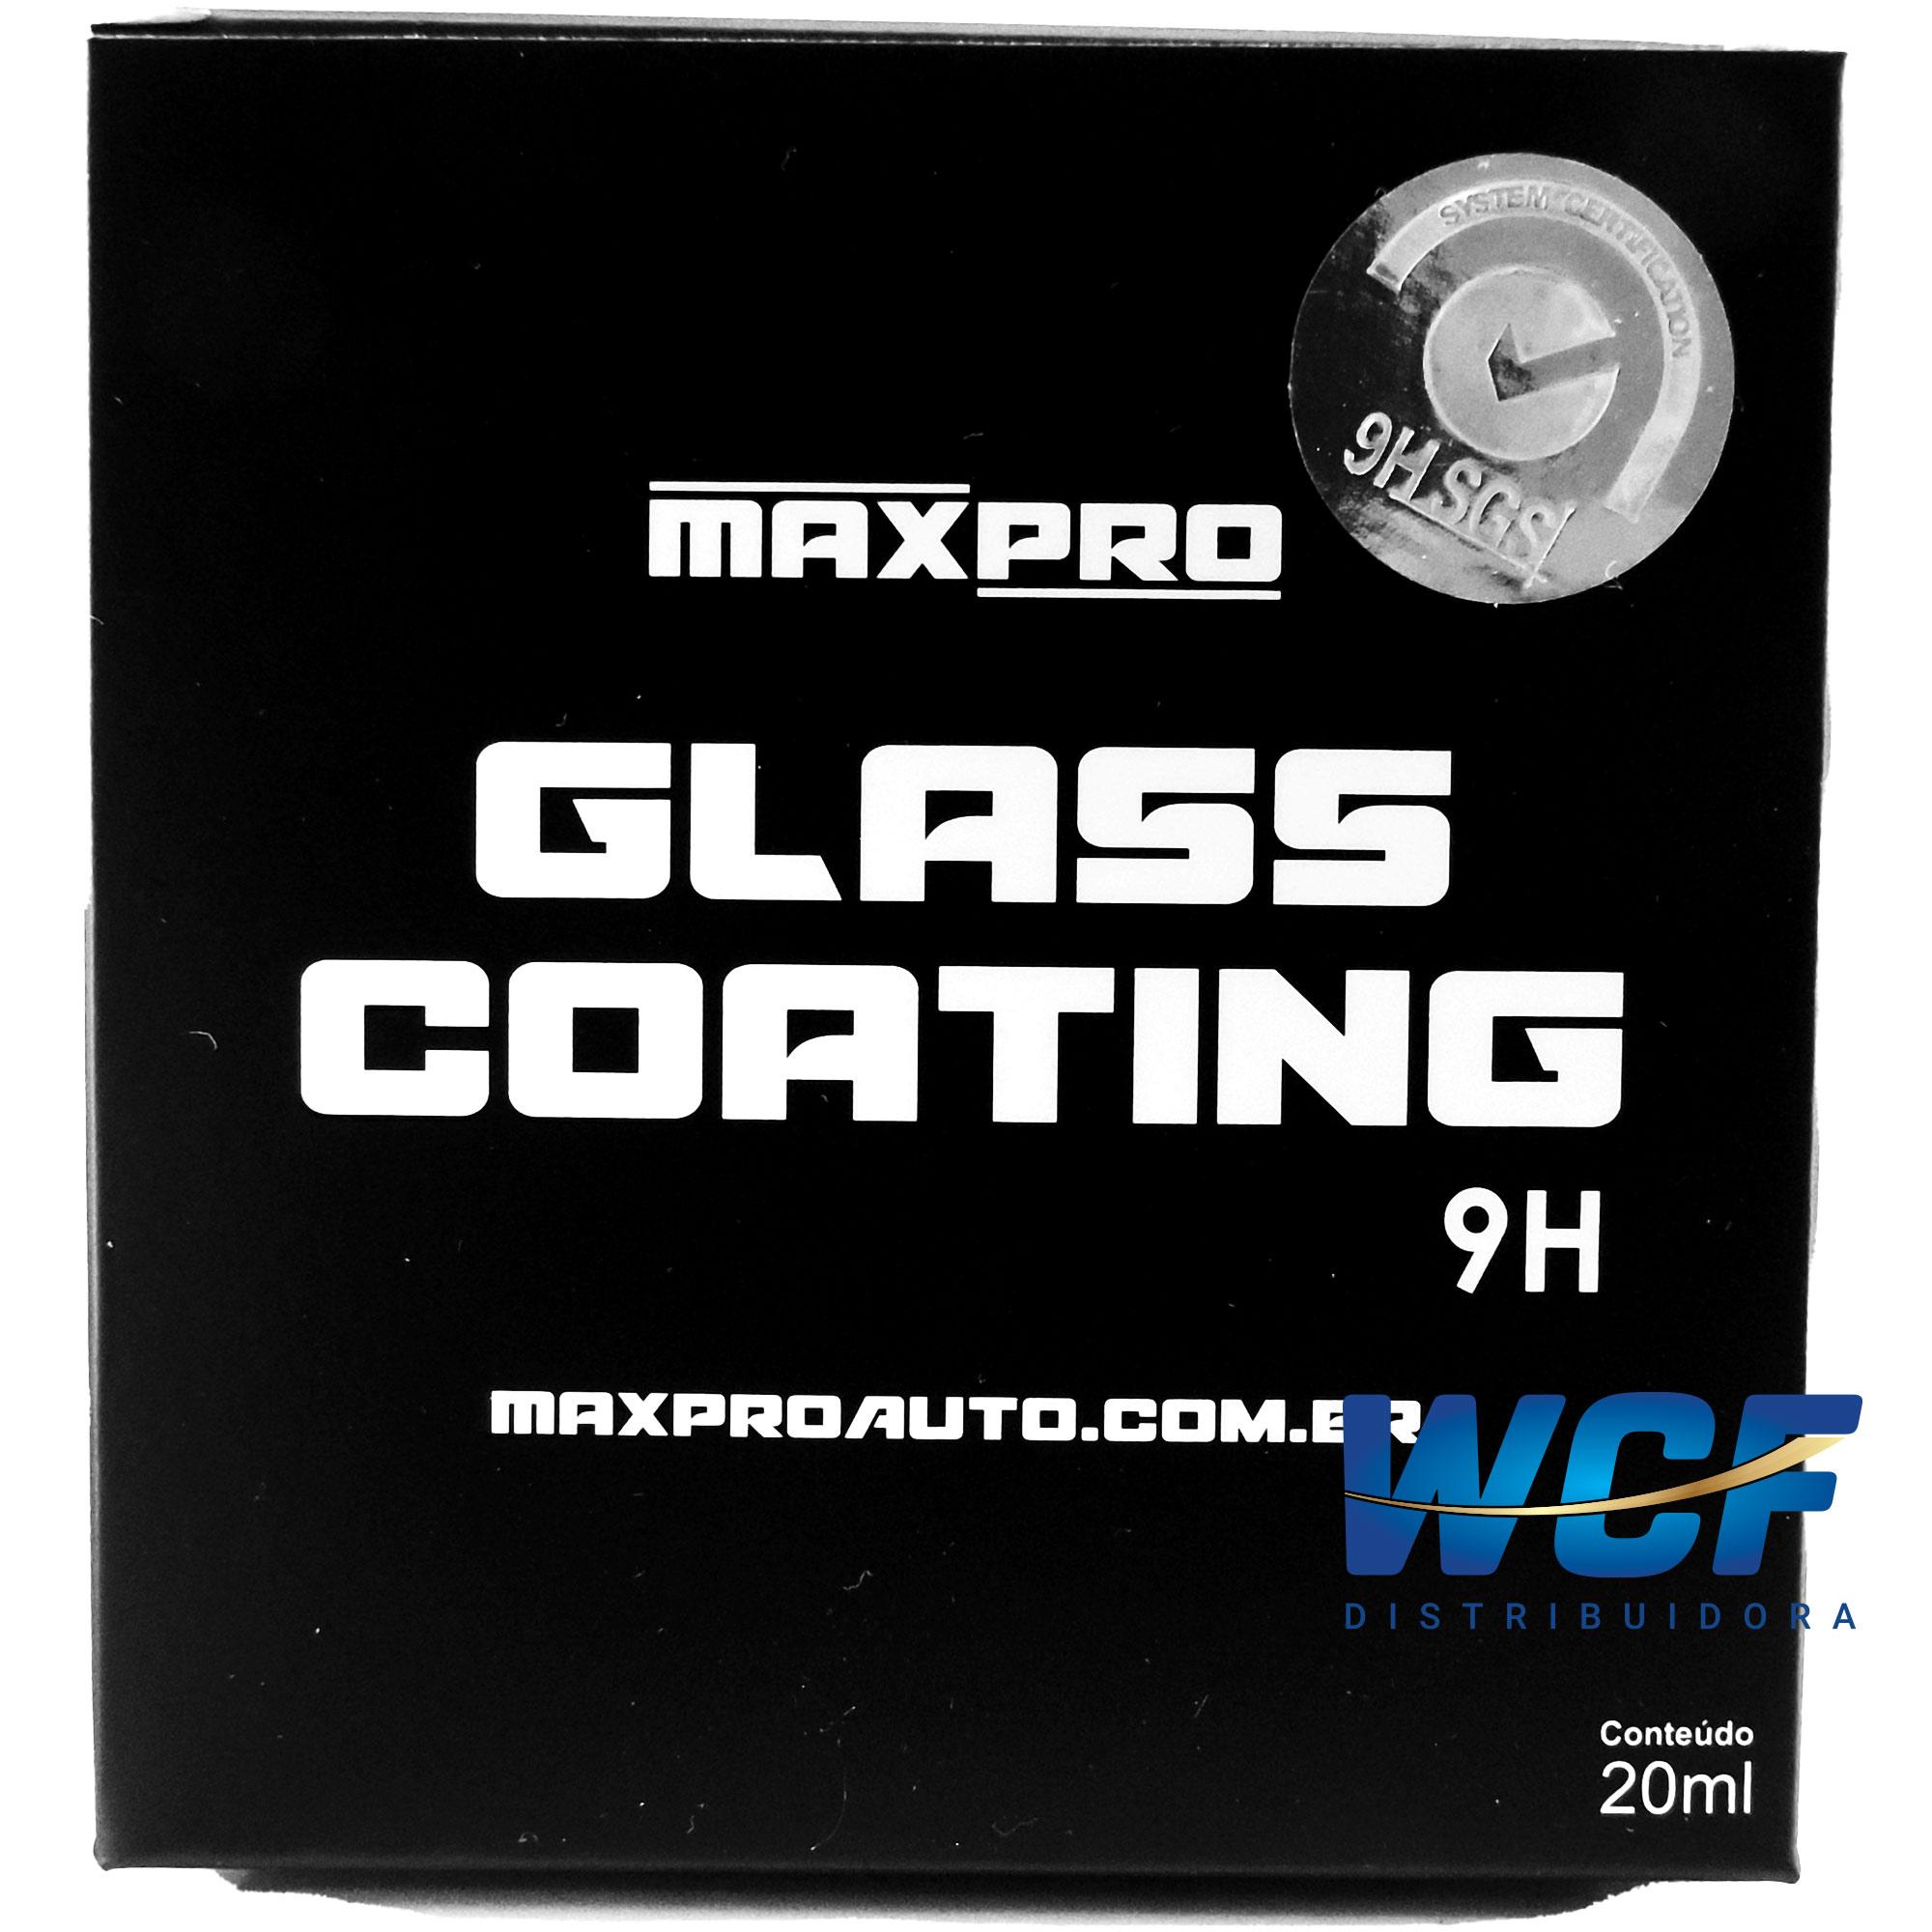 MAXPRO GLASS COATING 9H 20ML